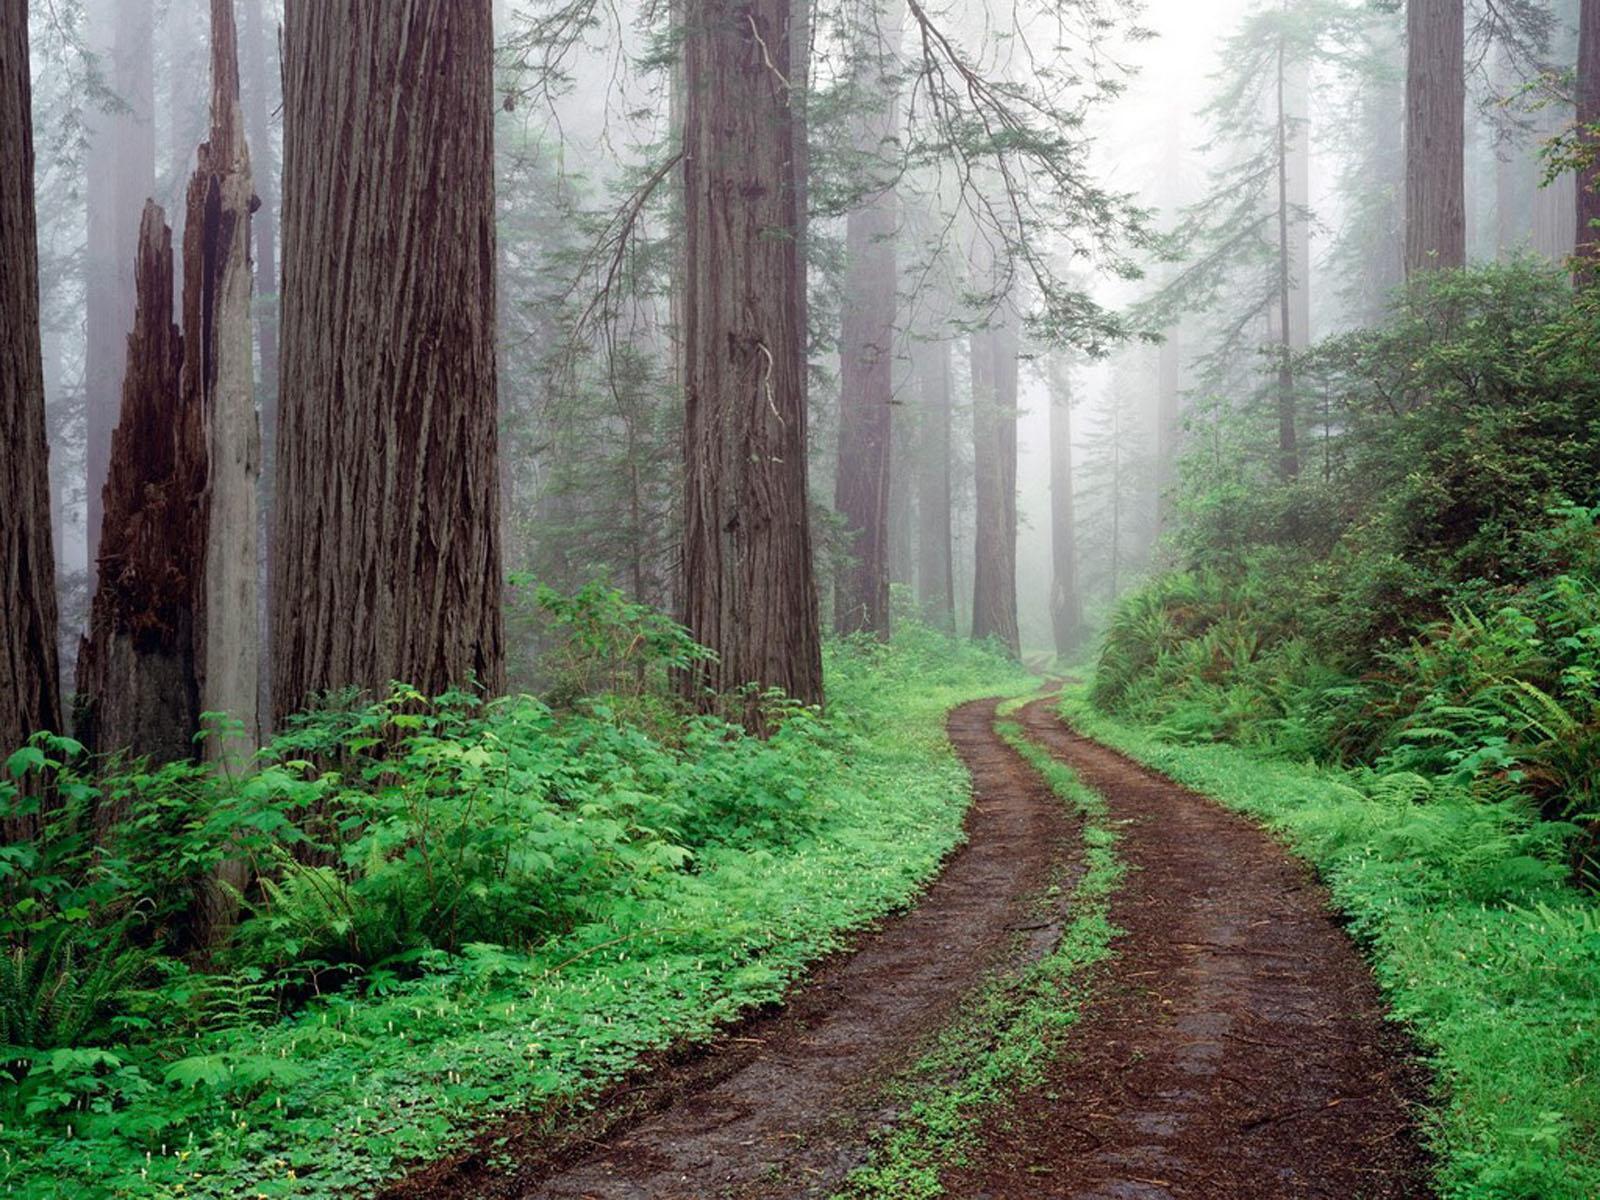 Forest Road Wallpapers Desktop Wallpaper